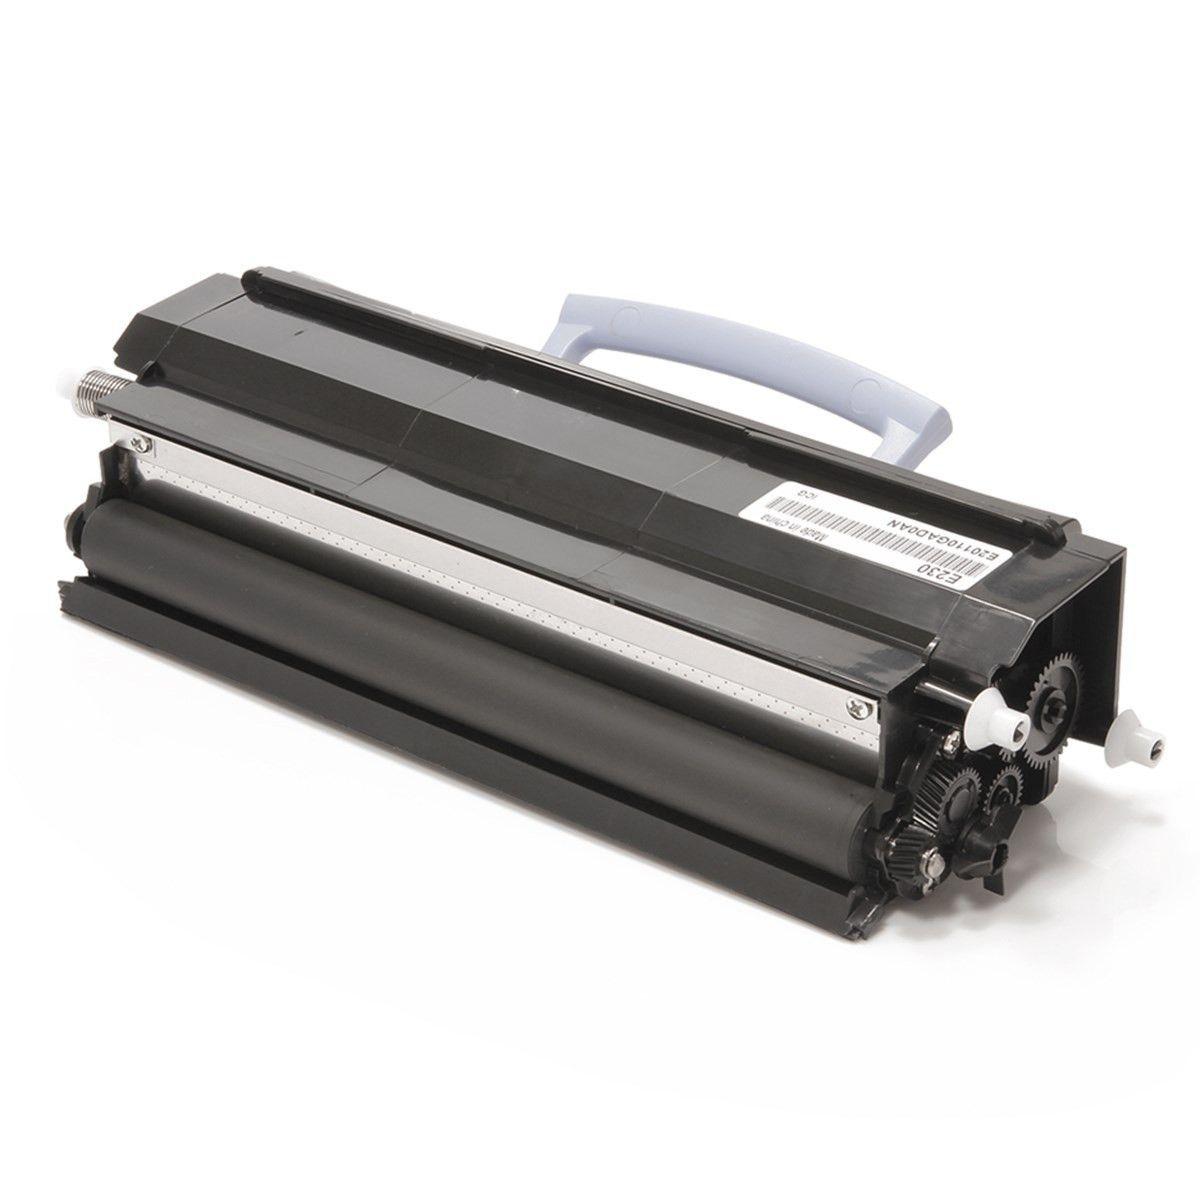 Toner Lexmark E230 24018SL - Compativel - 2.5K